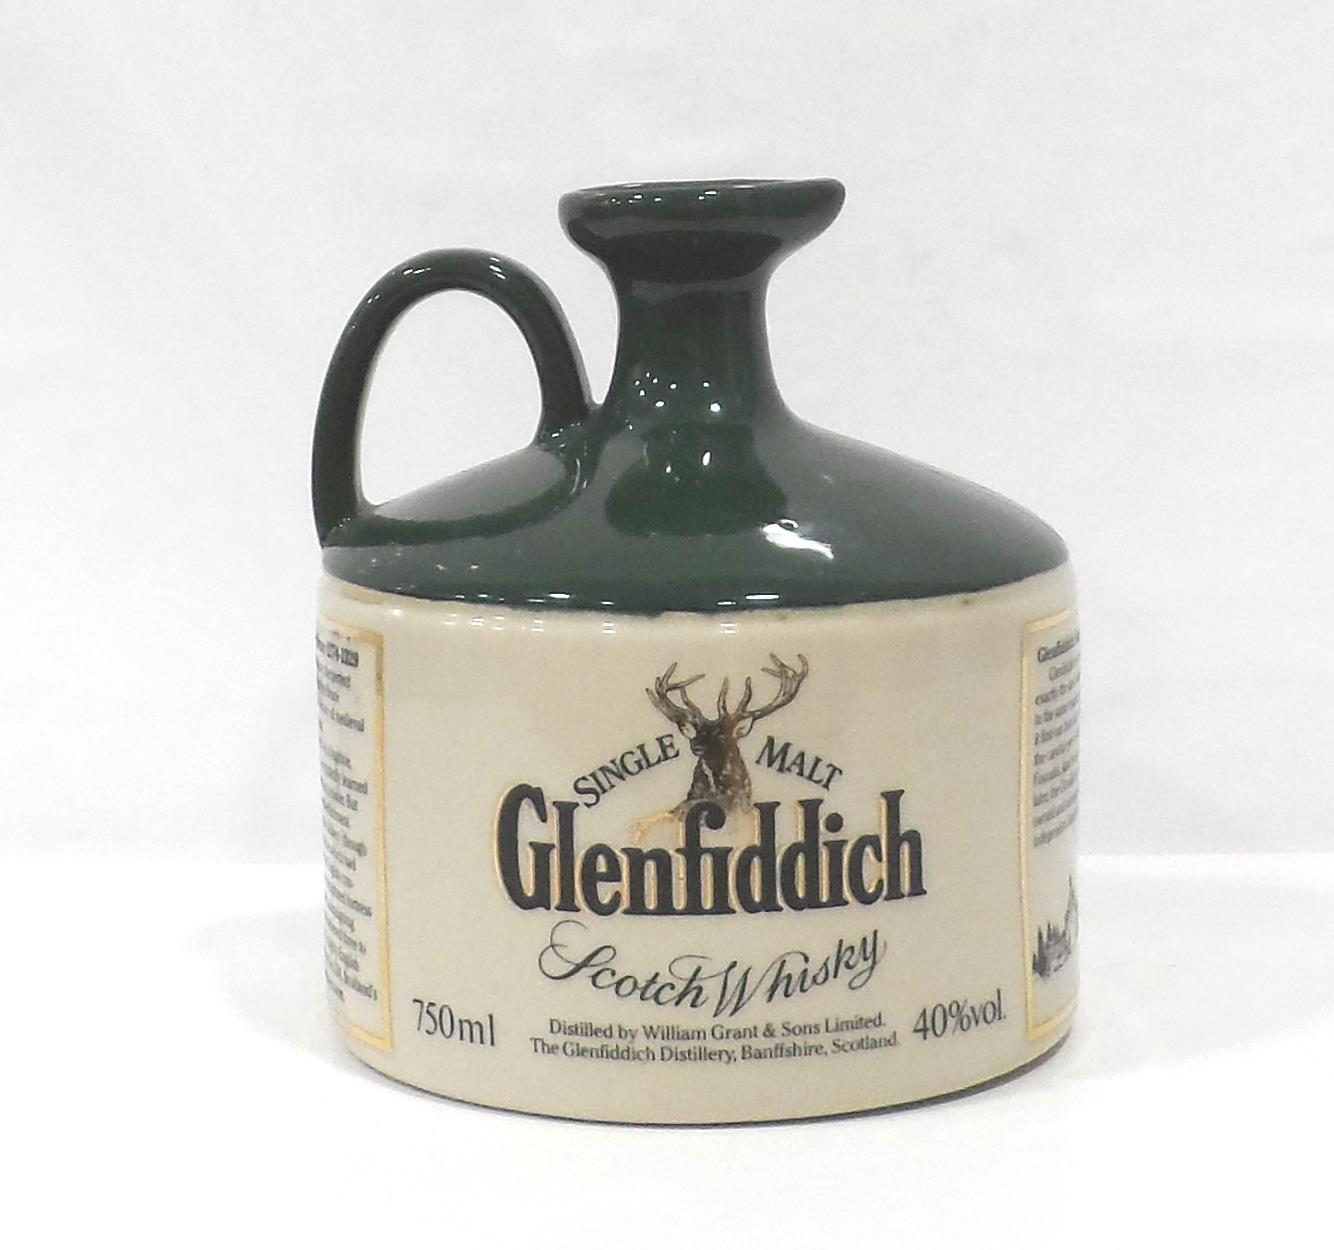 Lot 6 - GLENFIDDICH HERITAGE RESERVE ROBERT THE BRUCE An older decanter of the Glenfiddich Heritage